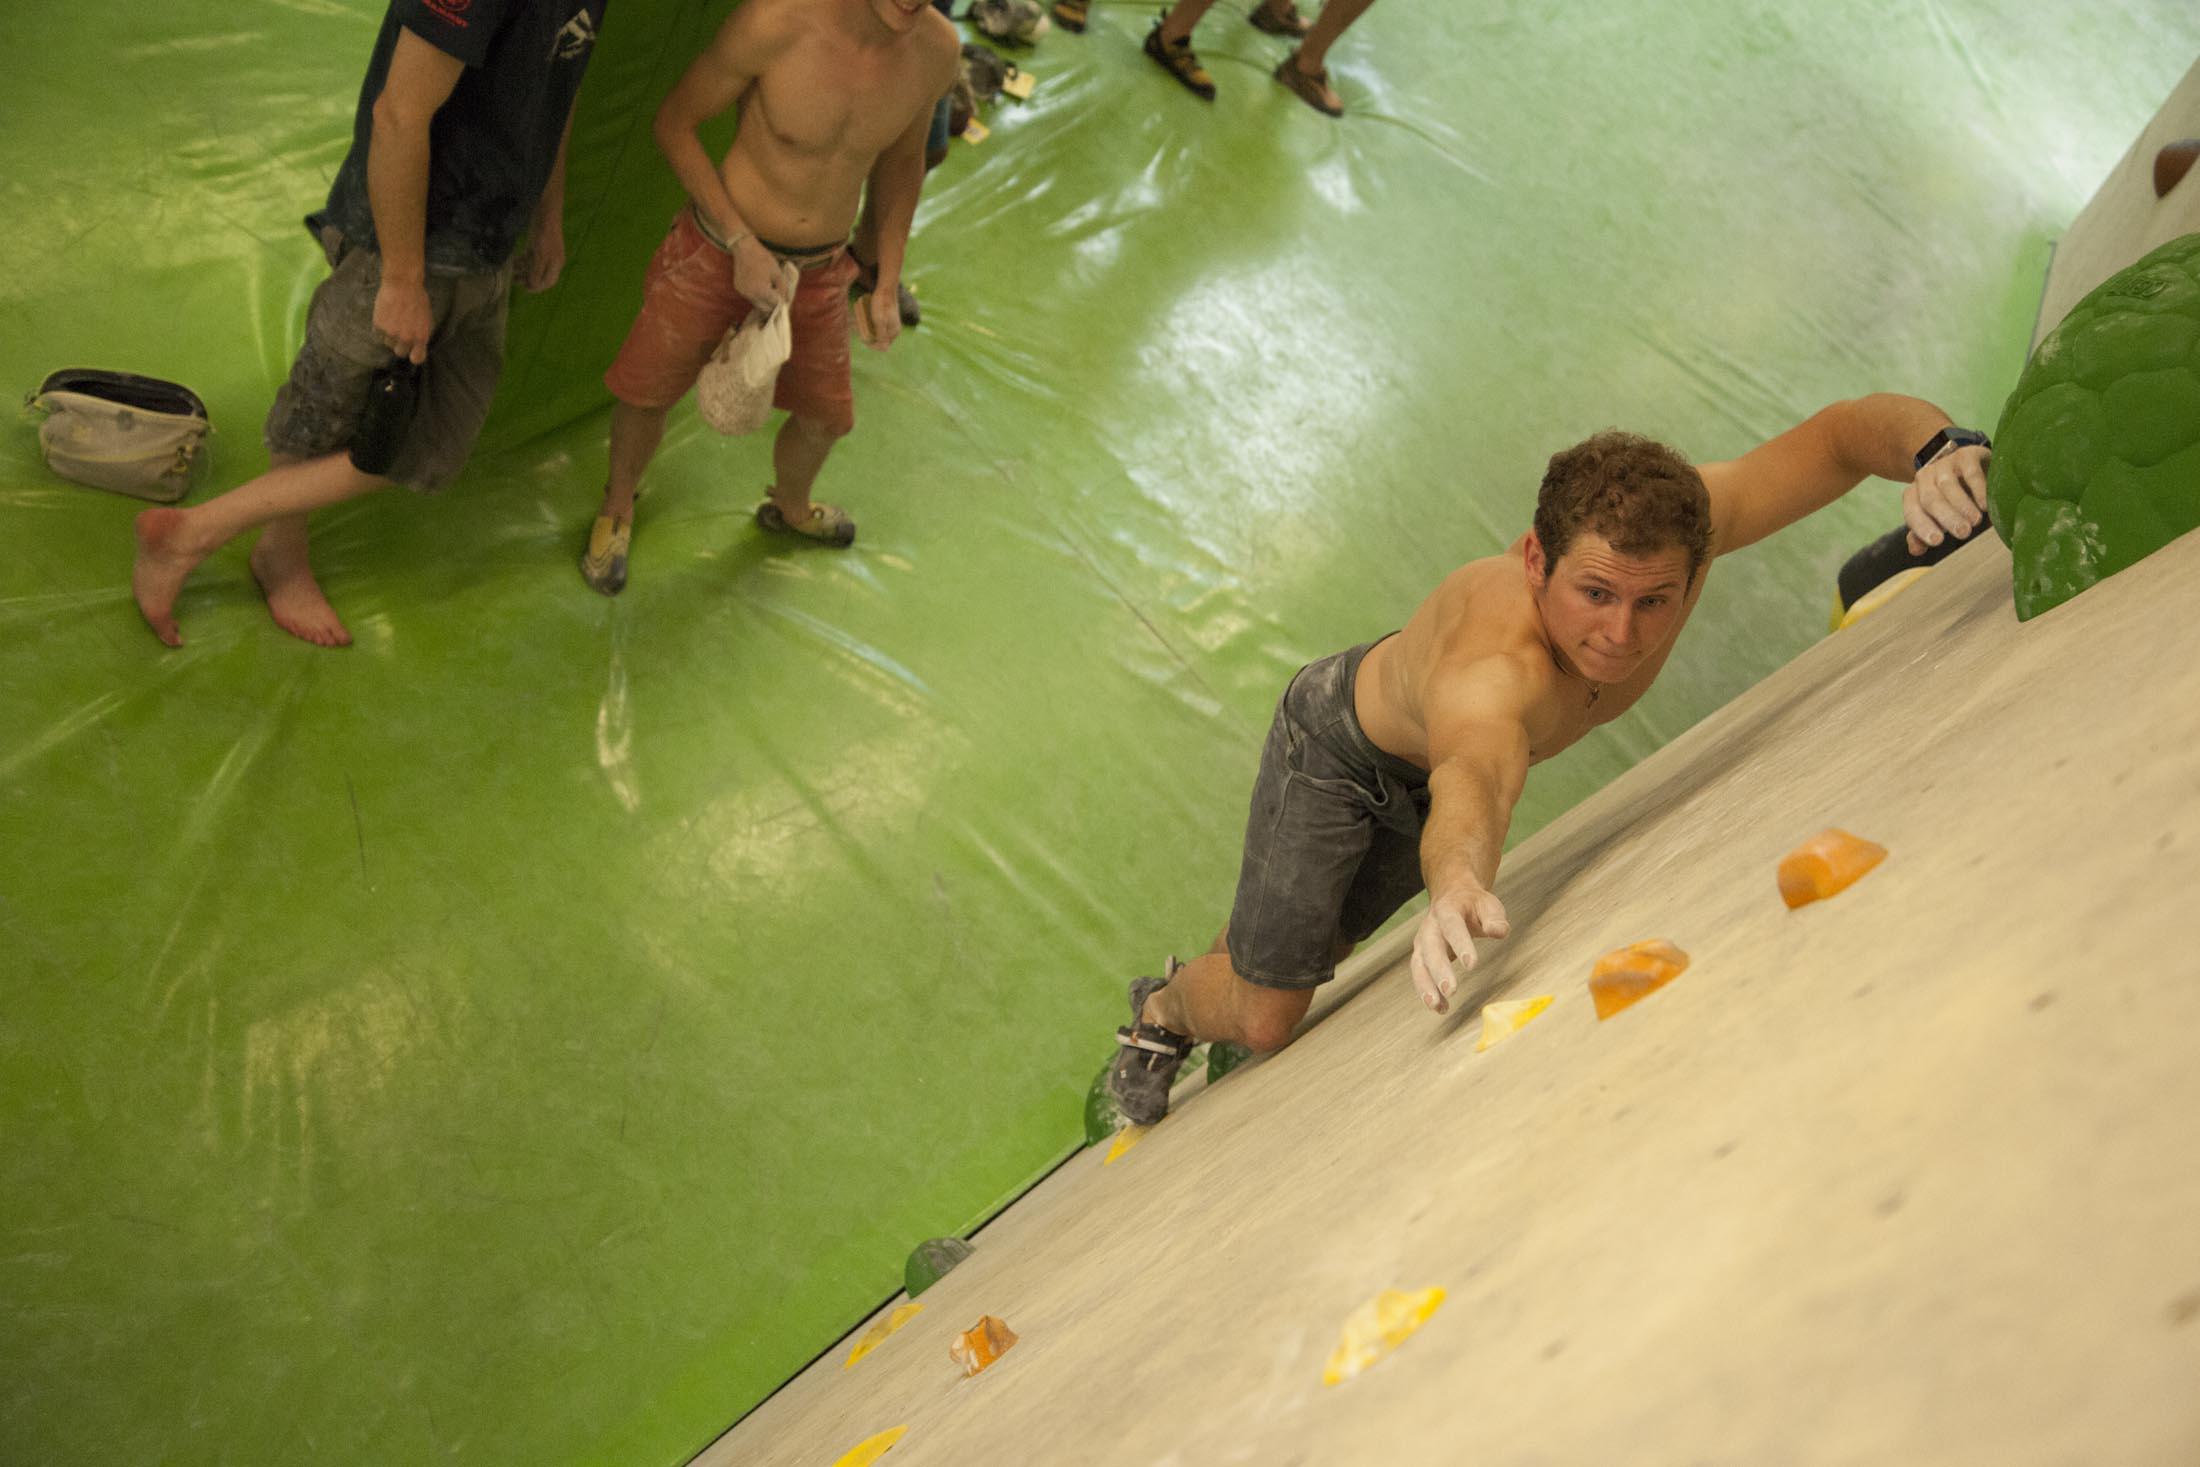 Quali, internationaler bouldercup Frankenjura 2016, BLOCKHELDEN Erlangen, Mammut, Bergfreunde.de, Boulderwettkampf07092016283